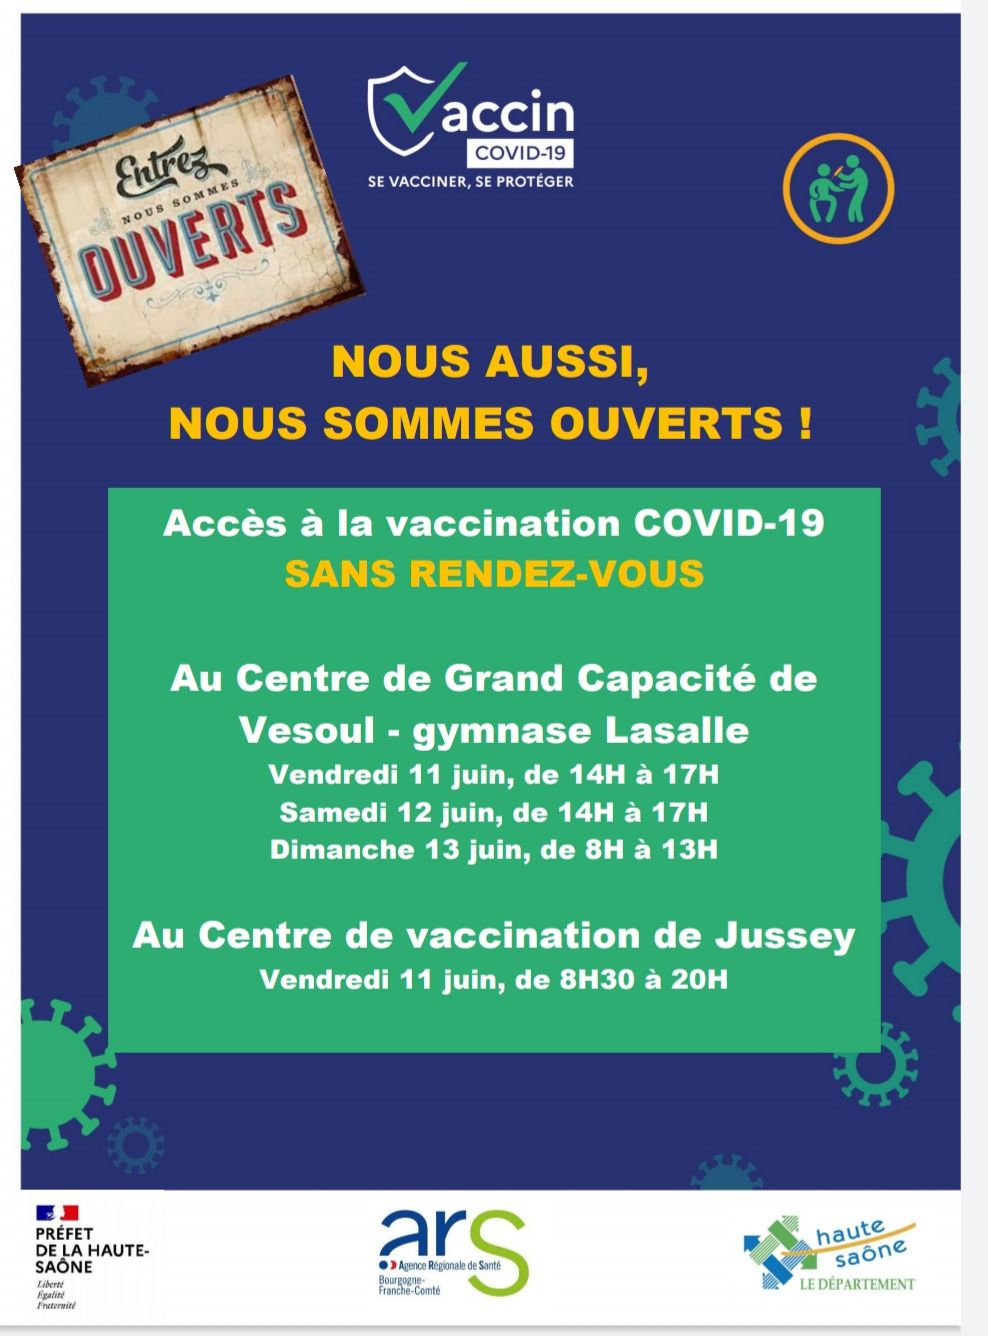 Covid 19 : vaccination possible sans RDV